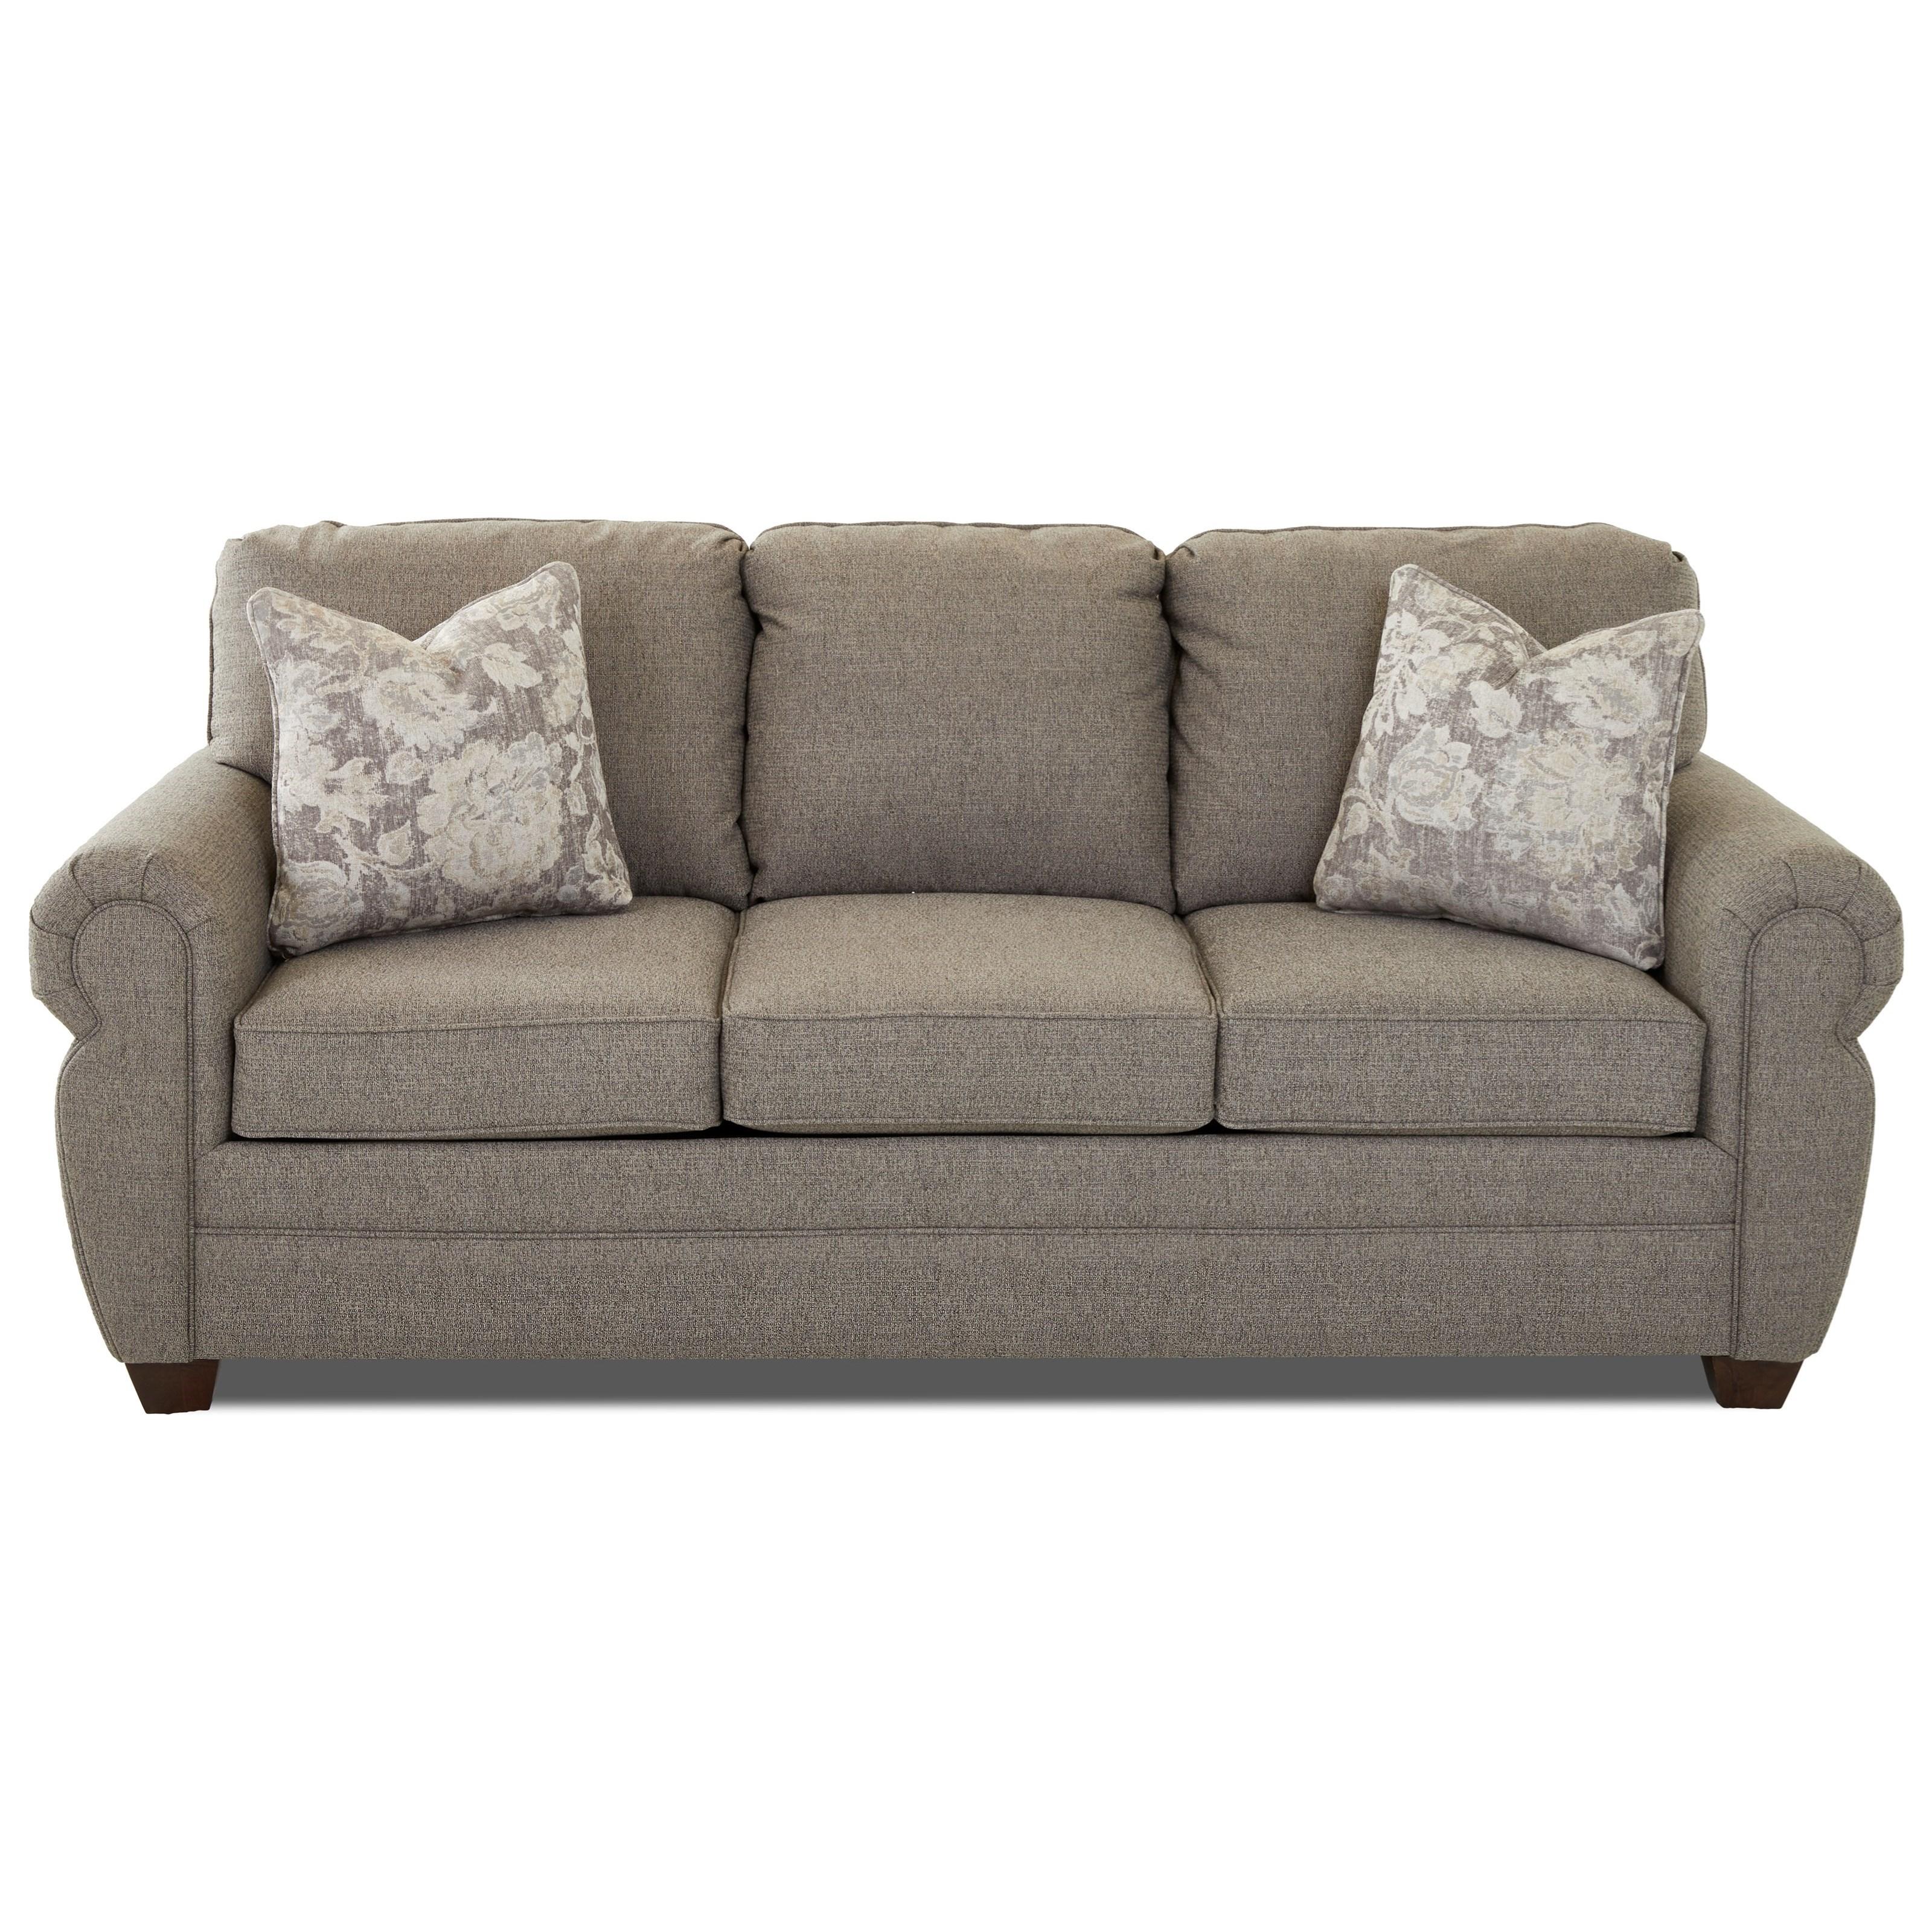 E3000 Aqsl Rolled Arm Sleeper Sofa